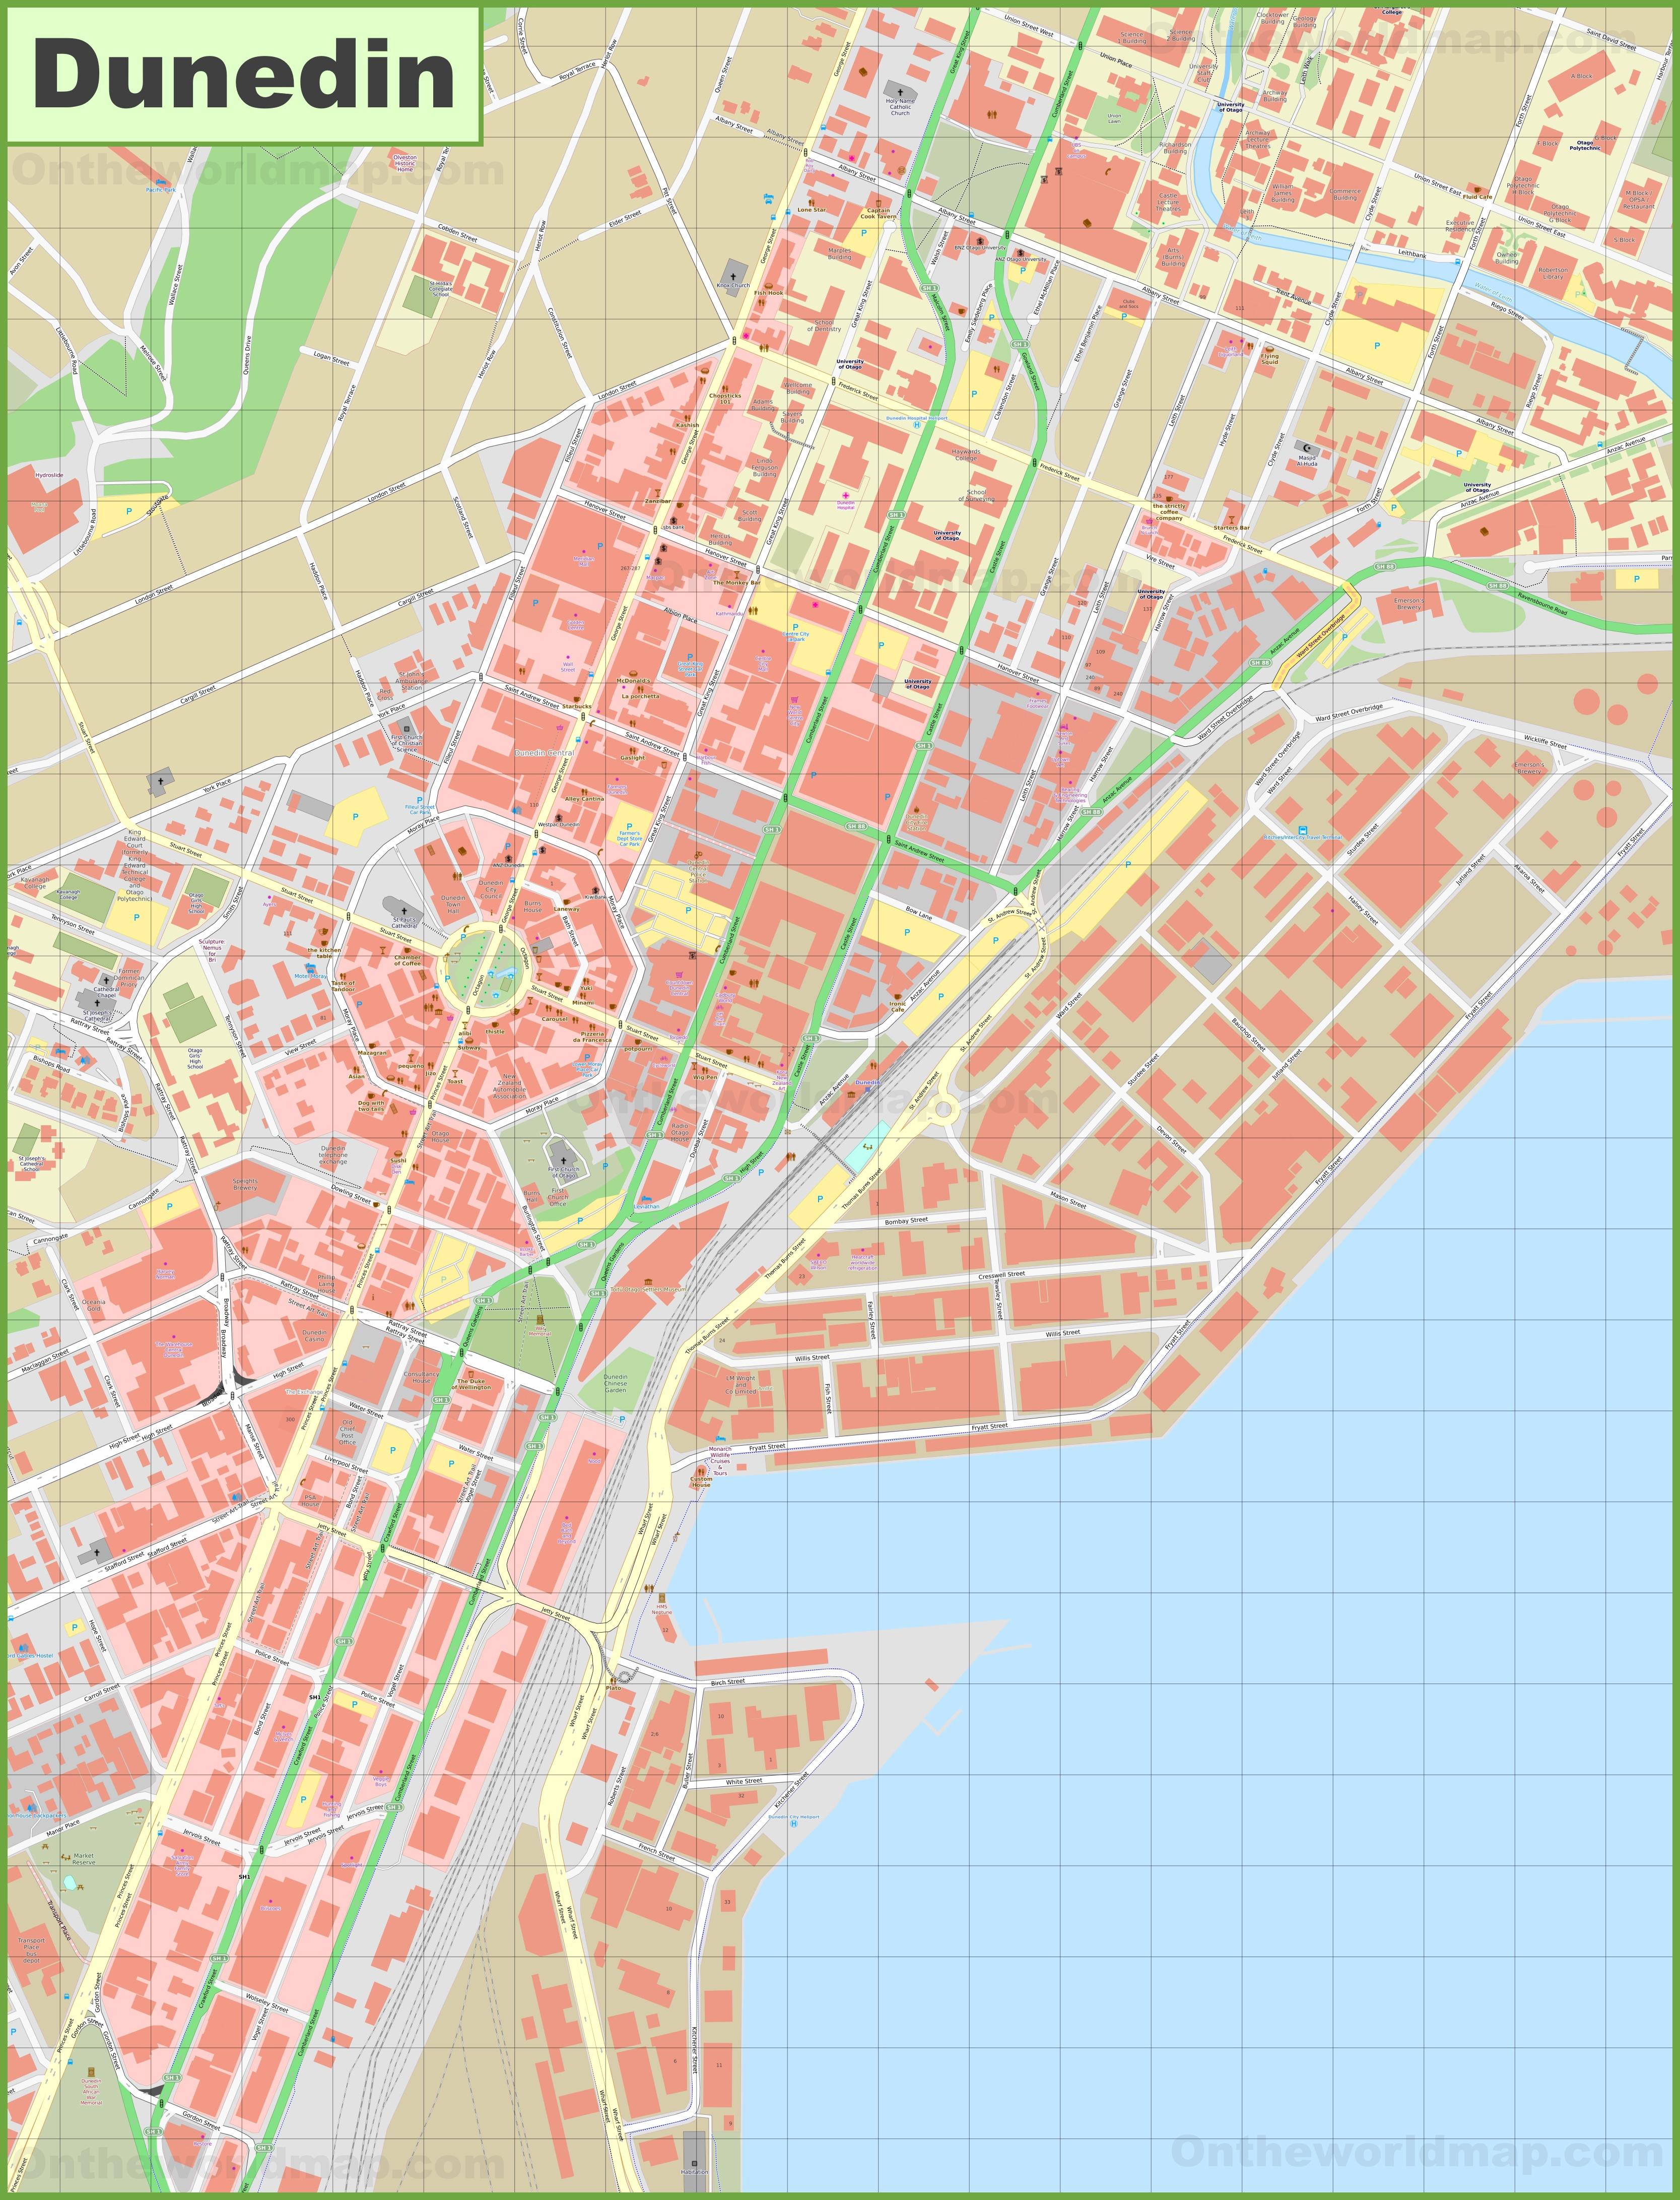 Dunedin Map New Zealand.Dunedin Cbd Map